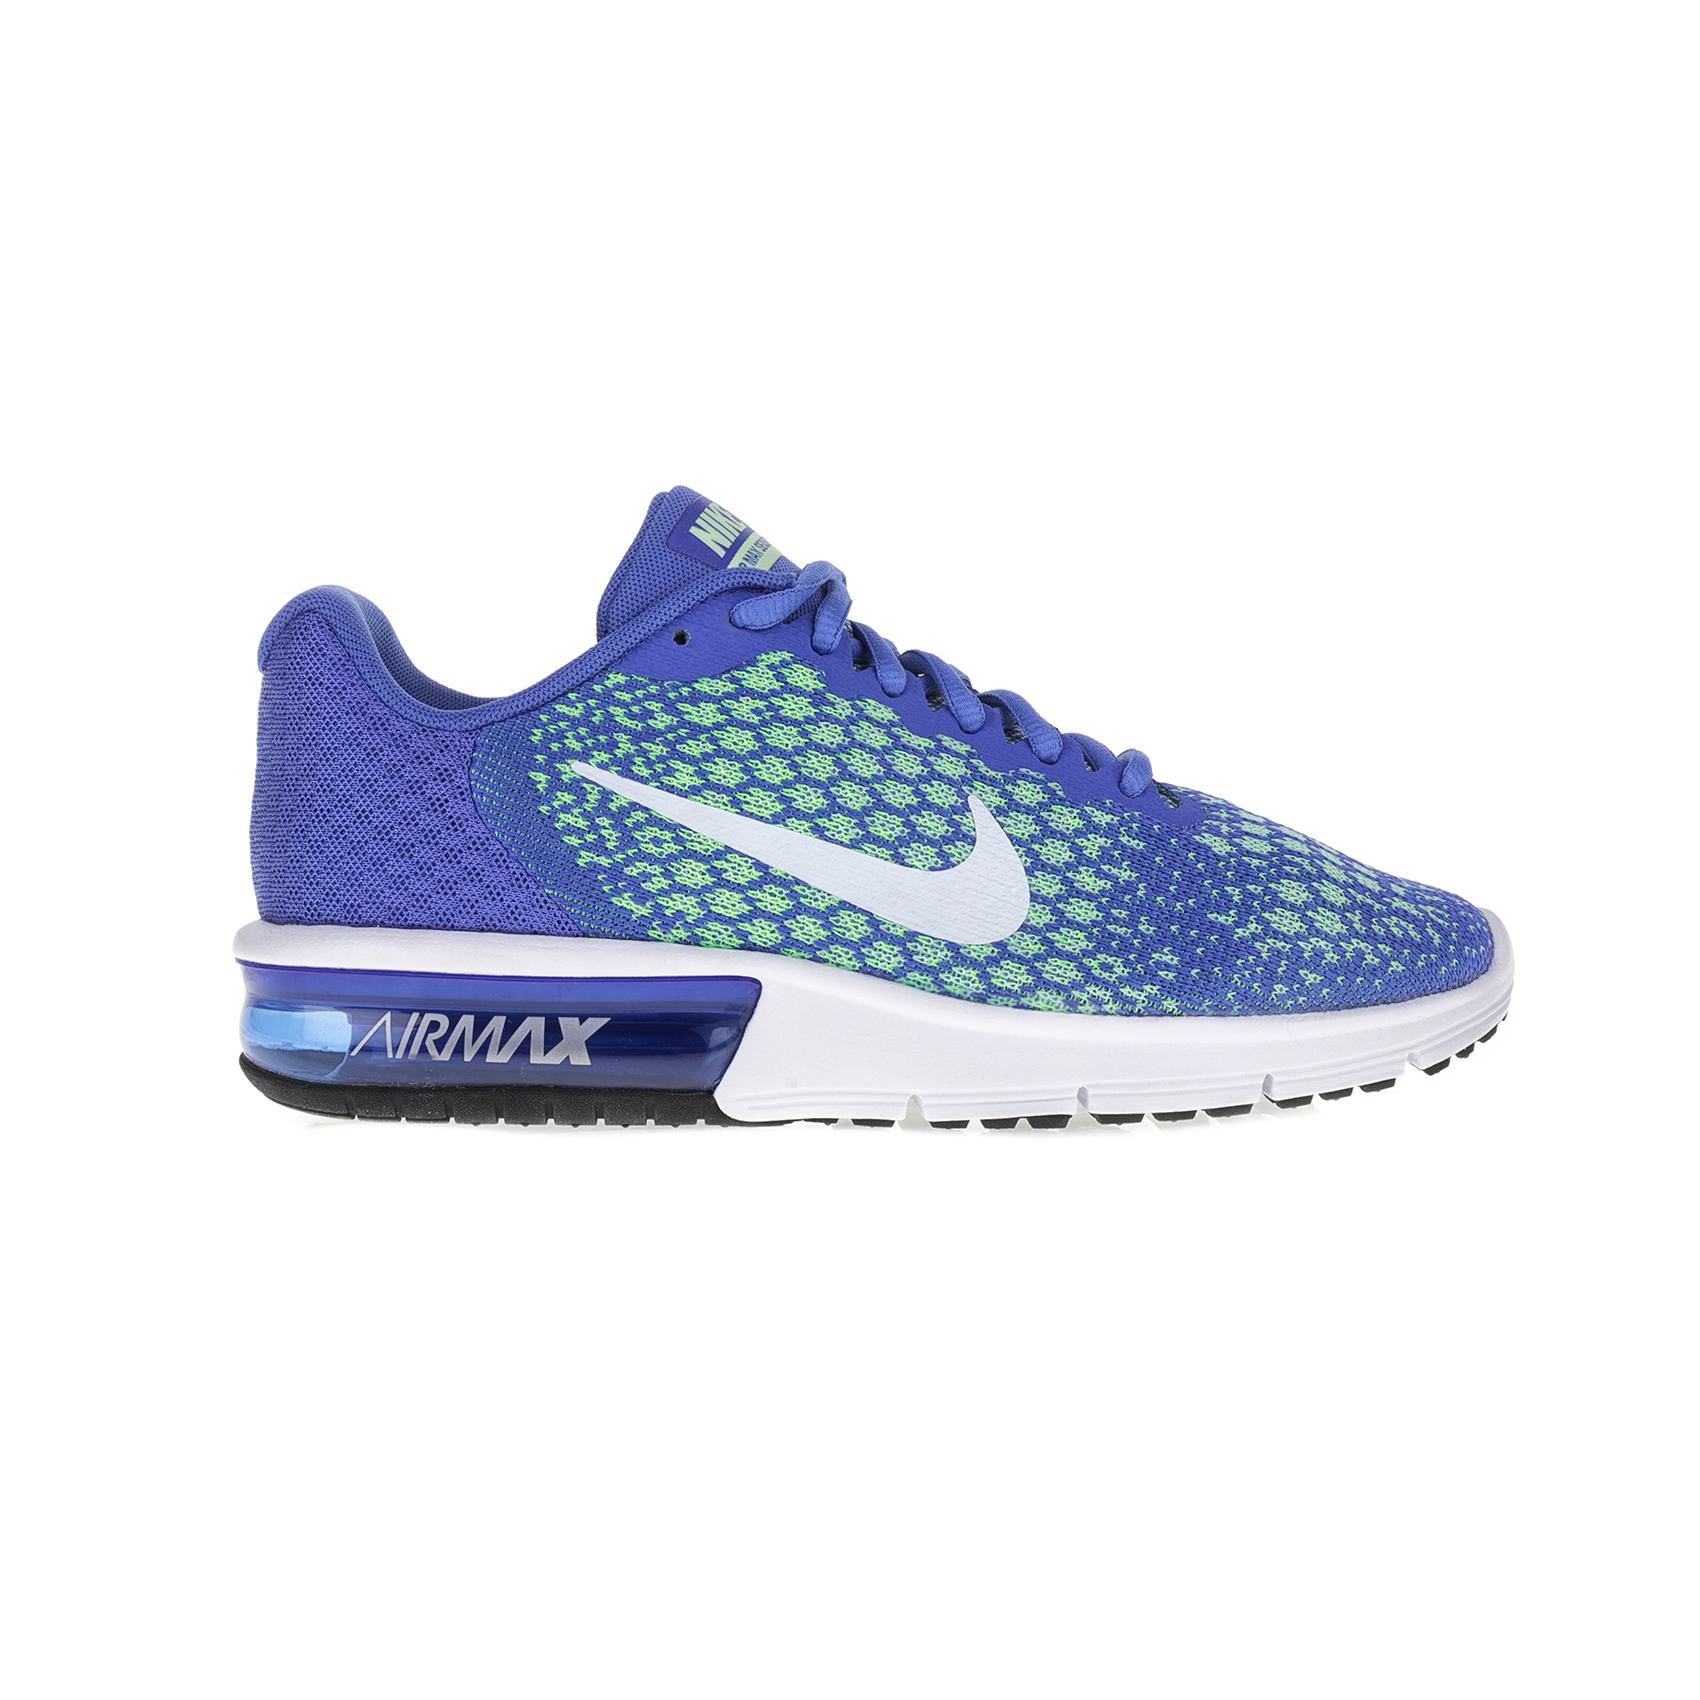 NIKE – Γυναικεία παπούτσια για τρέξιμο Nike AIR MAX 2017 μοβ-μπλε